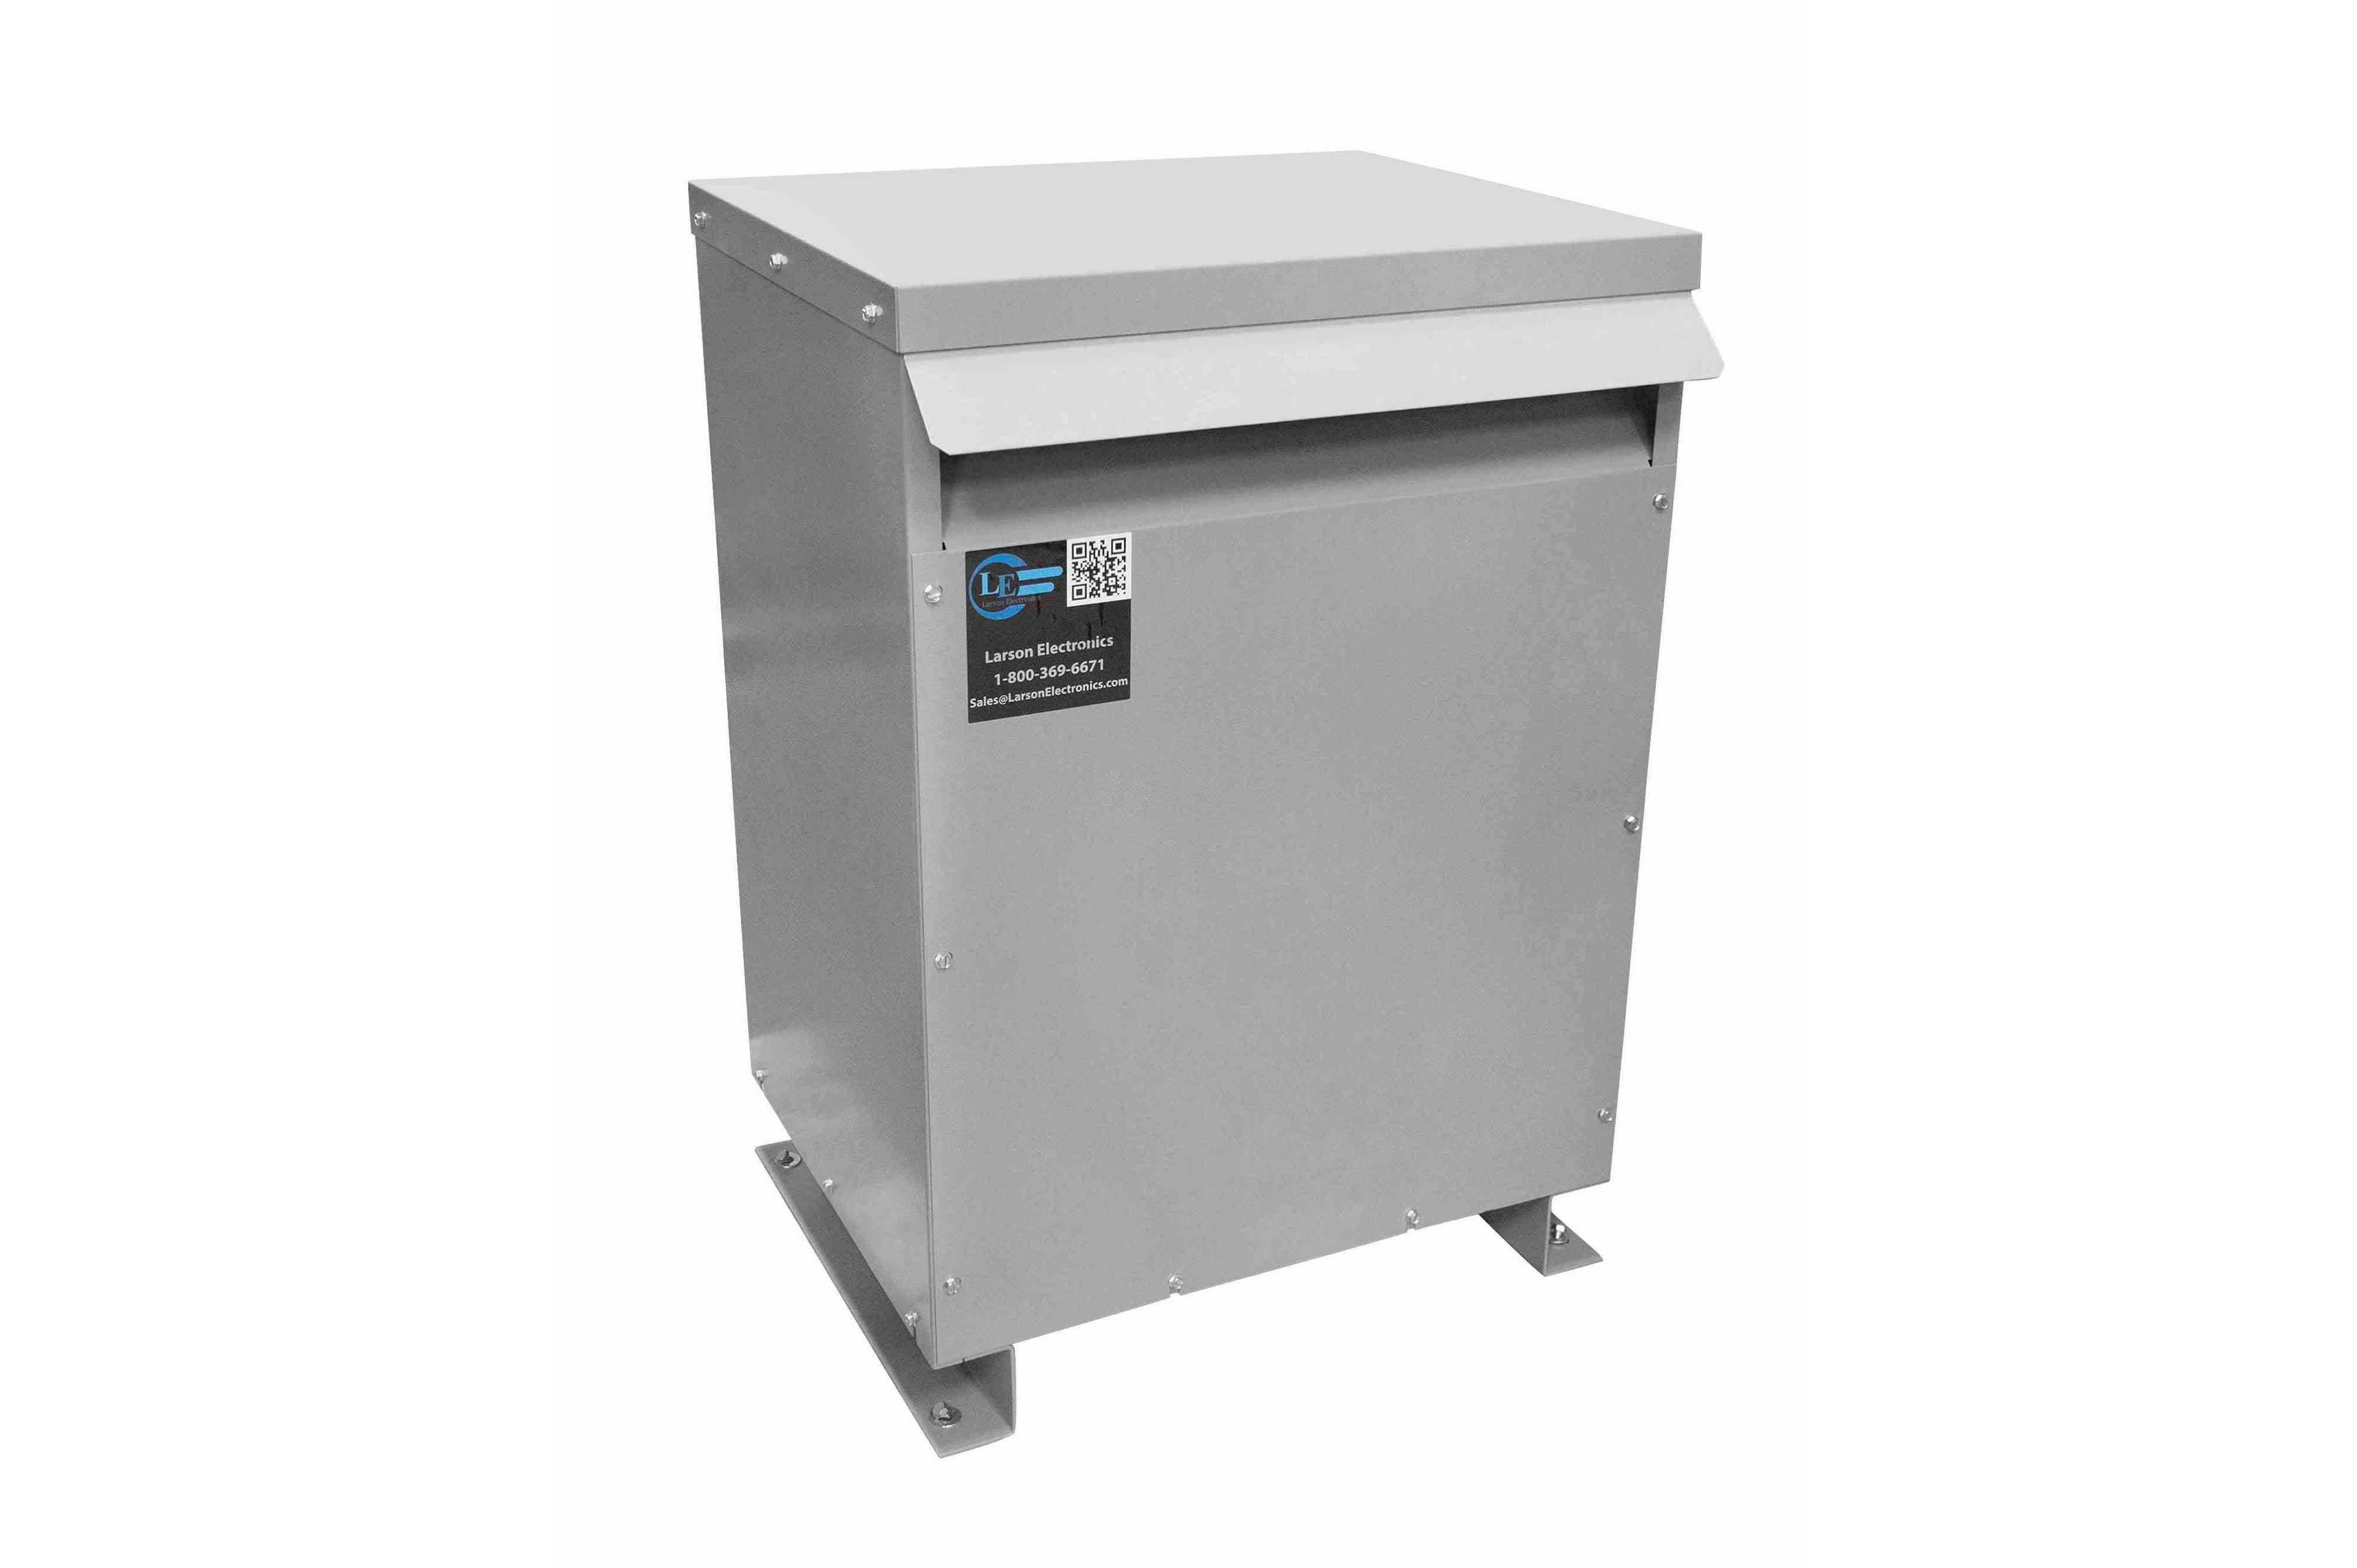 13 kVA 3PH Isolation Transformer, 208V Wye Primary, 380V Delta Secondary, N3R, Ventilated, 60 Hz